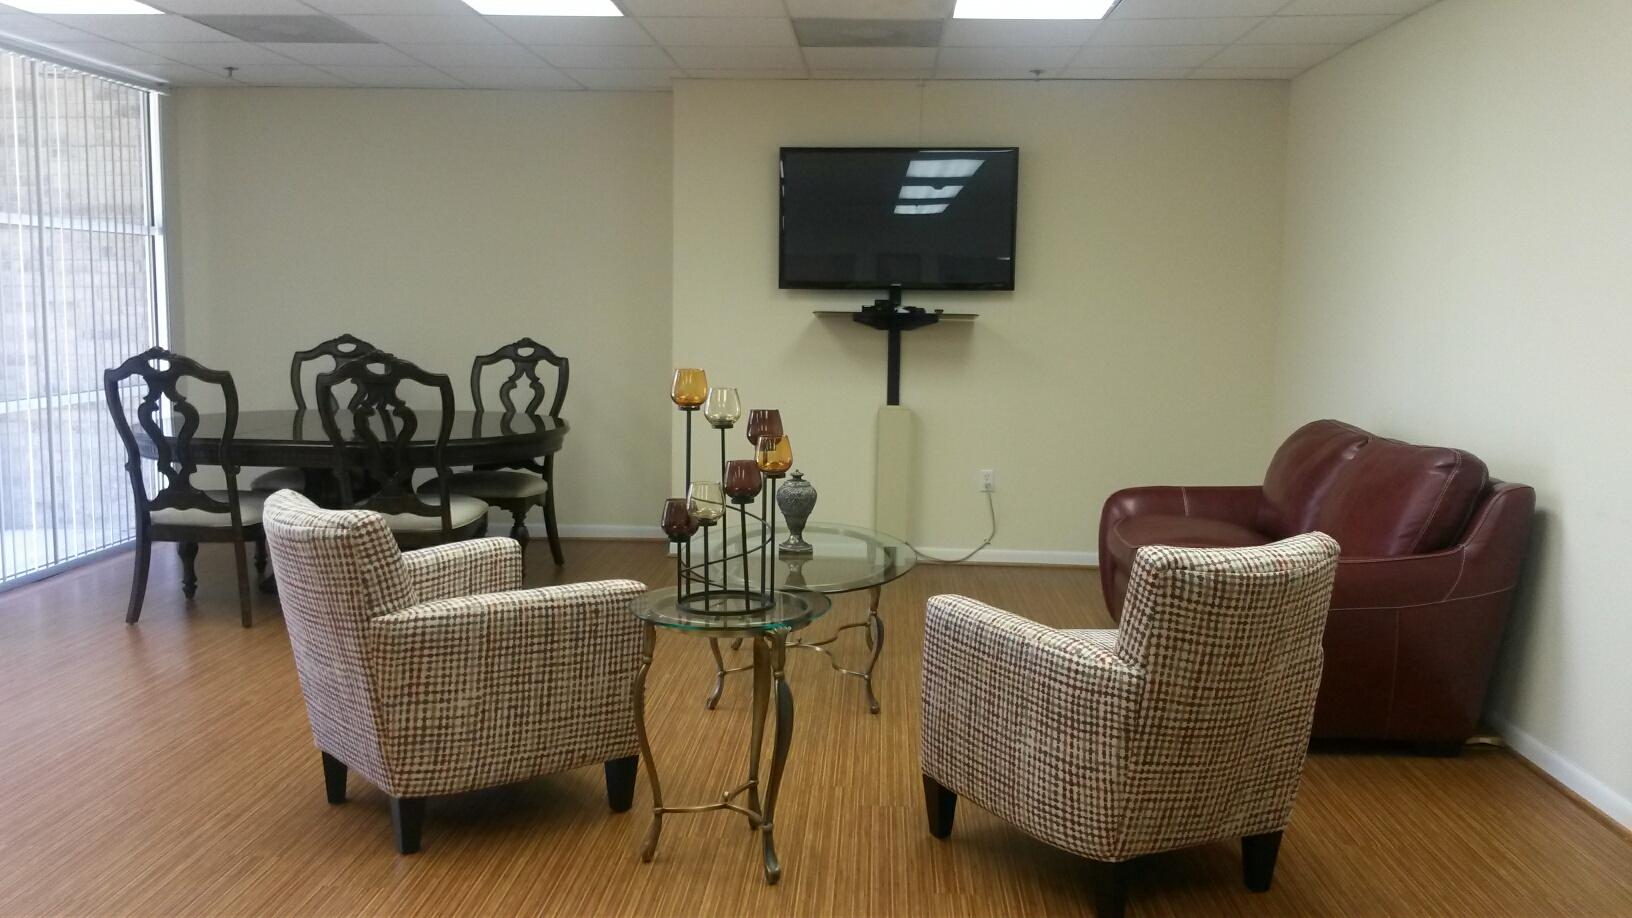 West Oaks community room seating room